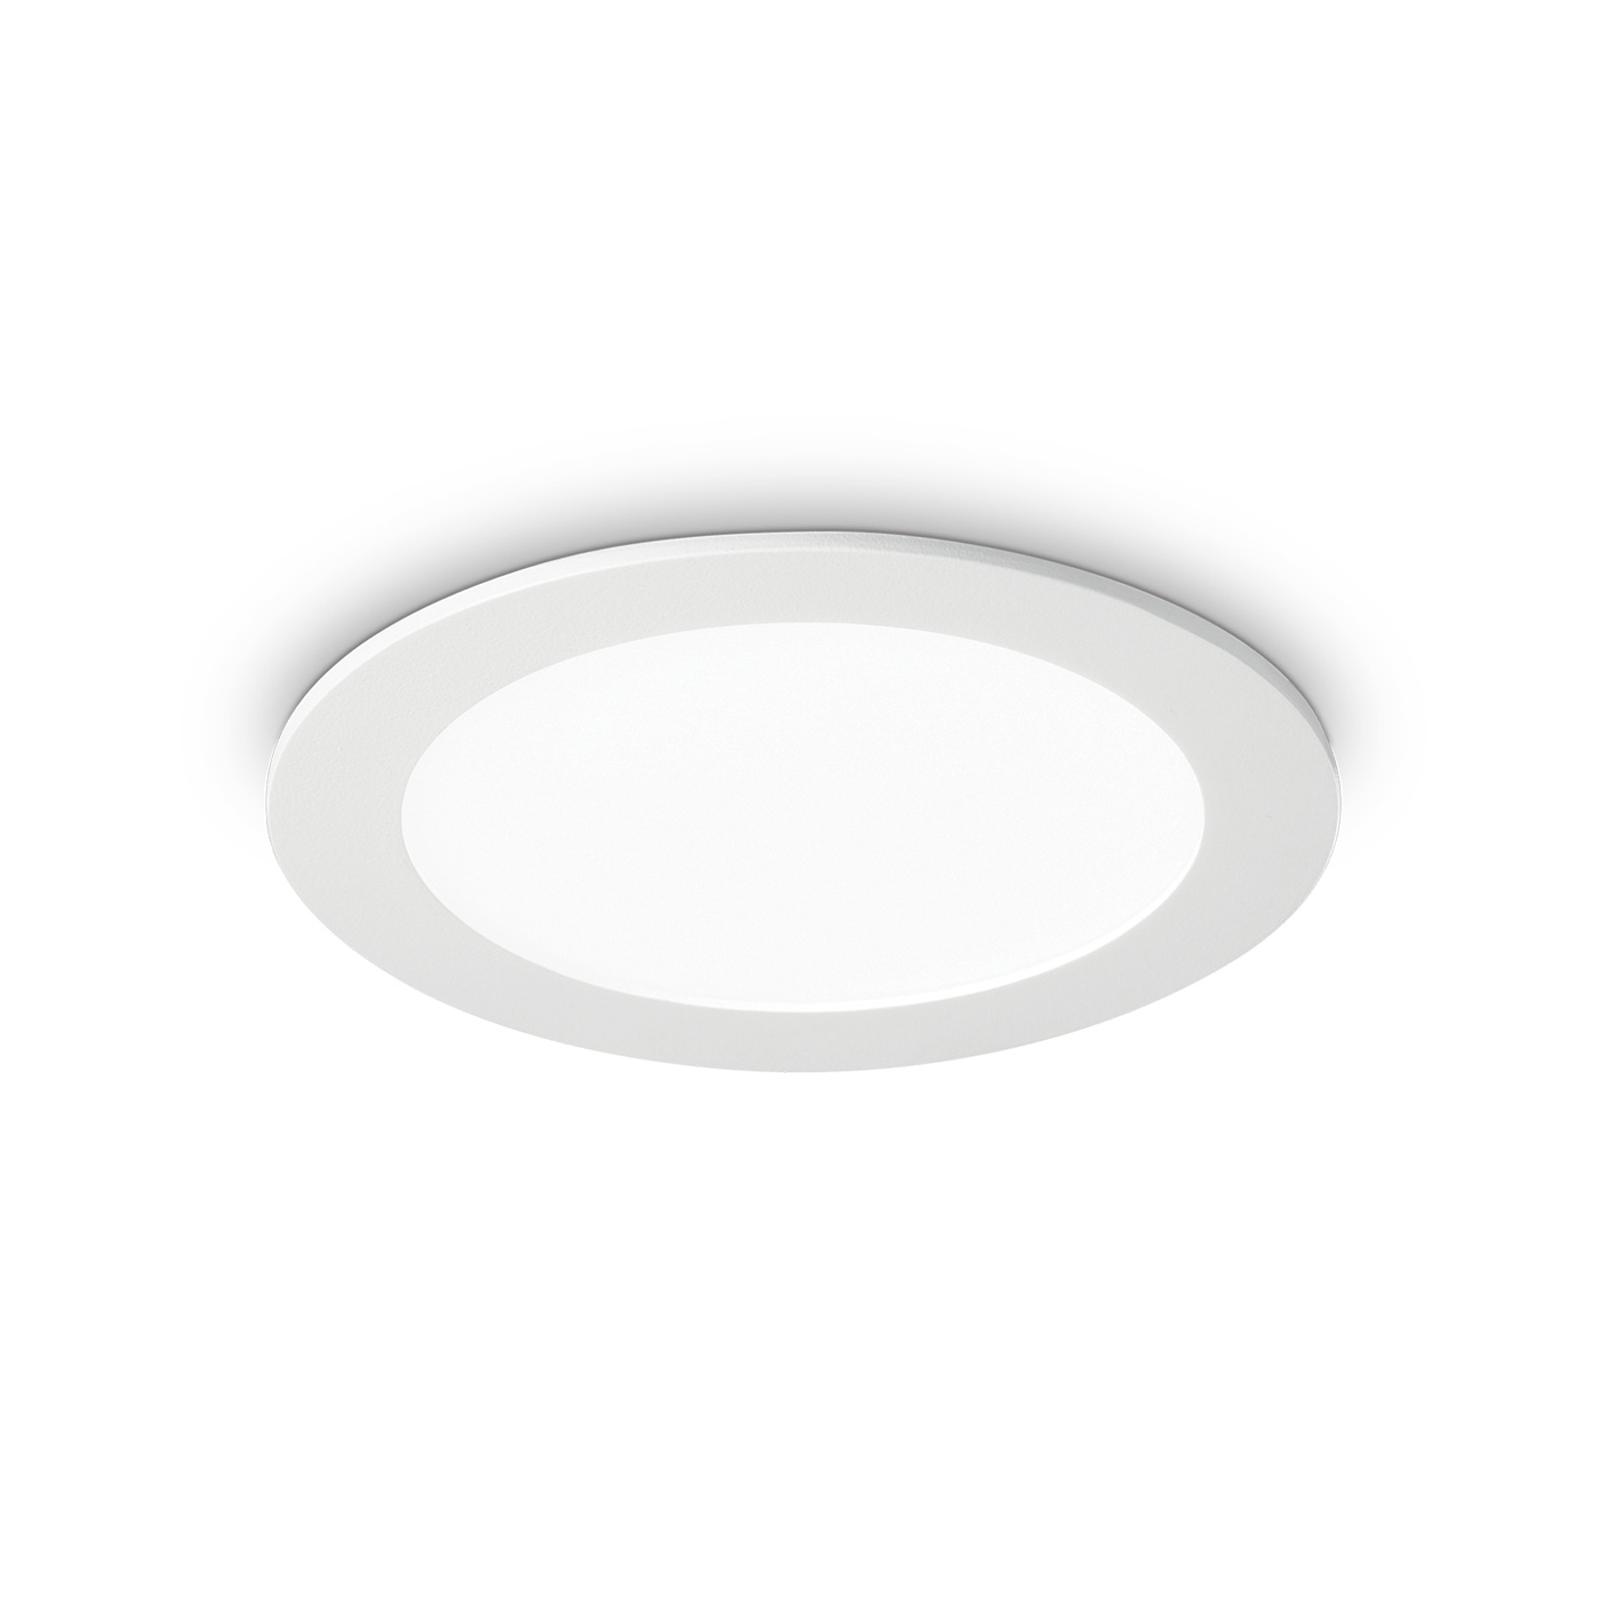 LED-takinbyggnadslampa Groove rund 3 000 K 11,8 cm